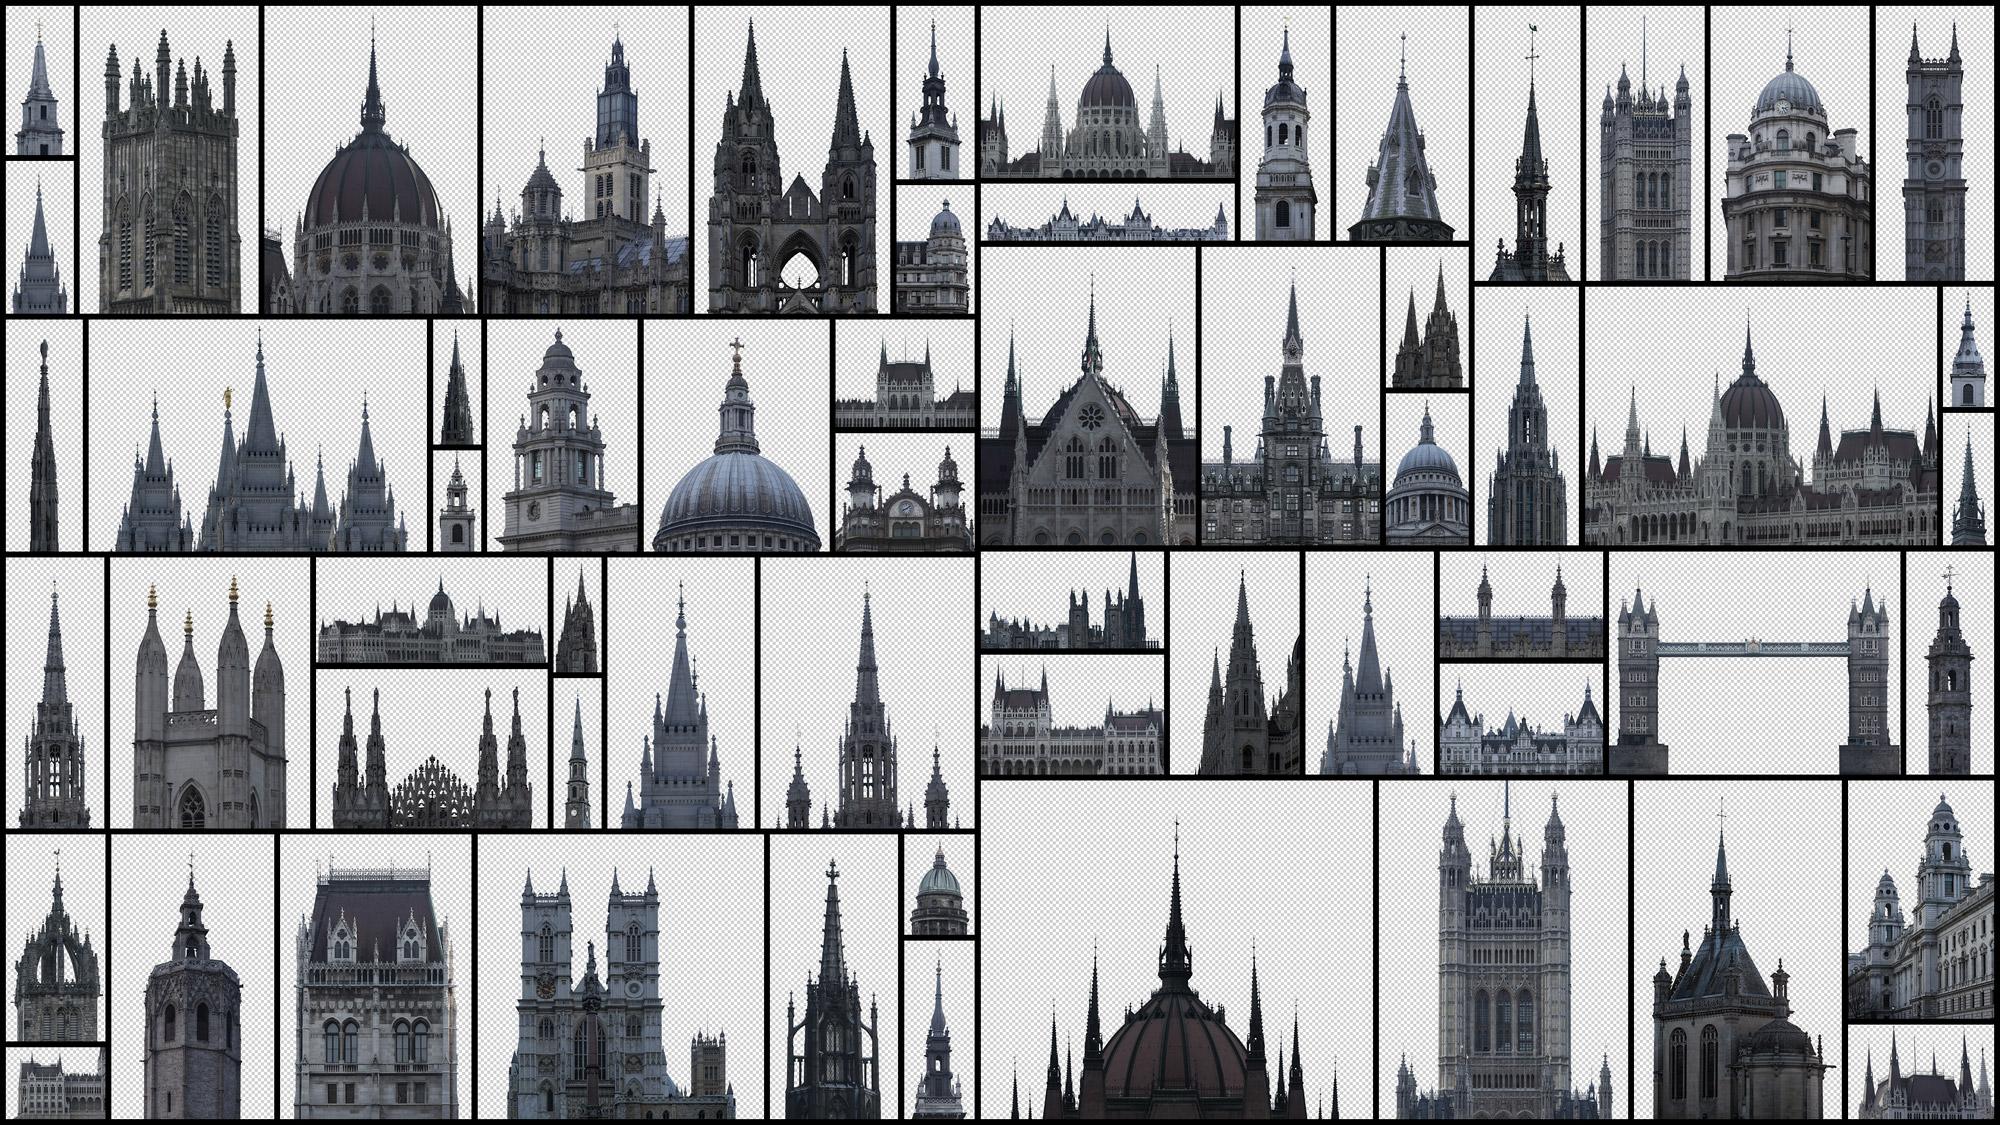 Gothic-Spires.jpg